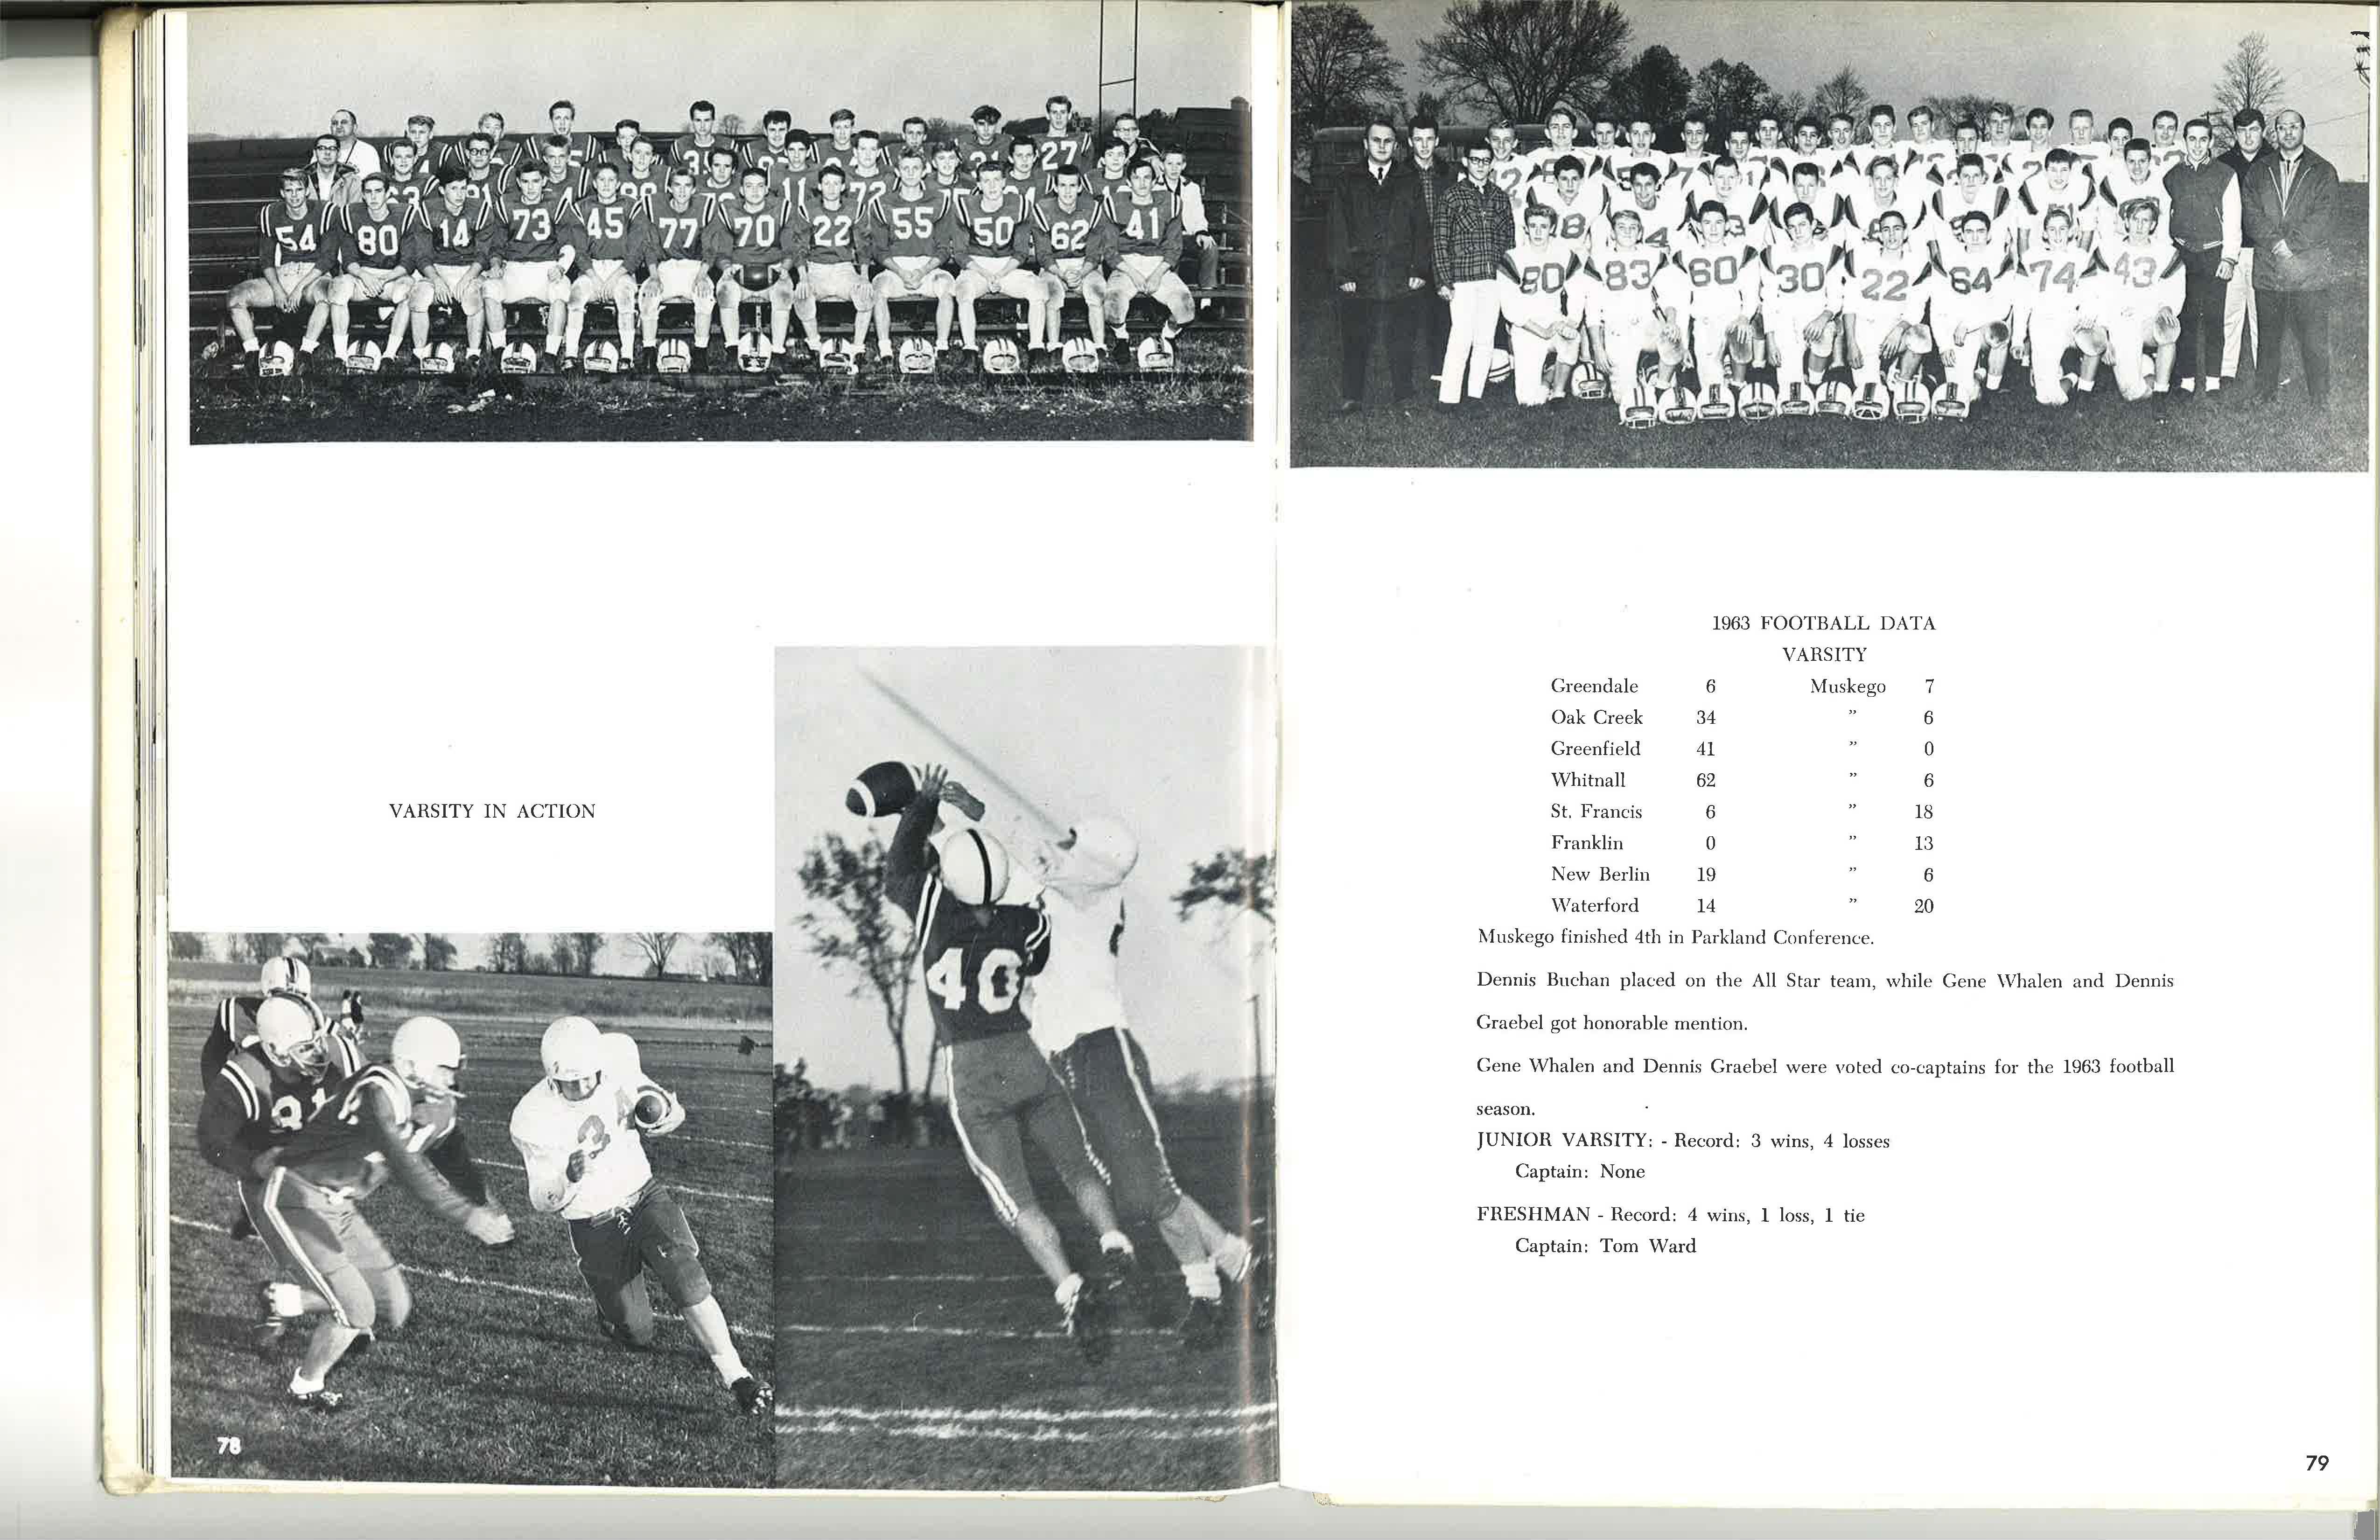 1964_Yearbook_Athletics_78-79.jpg